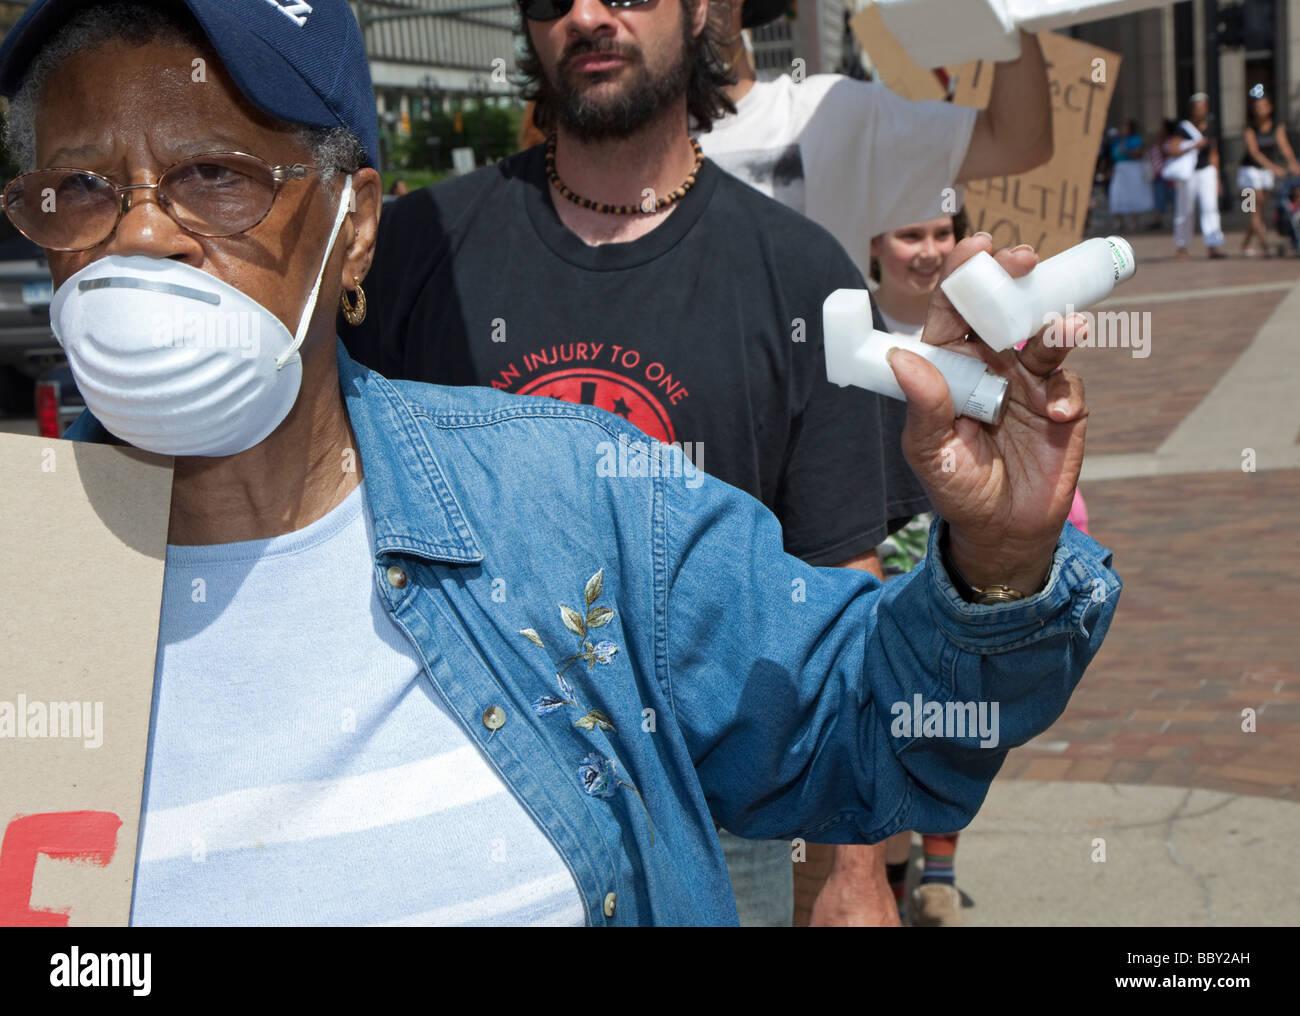 Demonstrators Demand Closing of Trash Incinerator - Stock Image